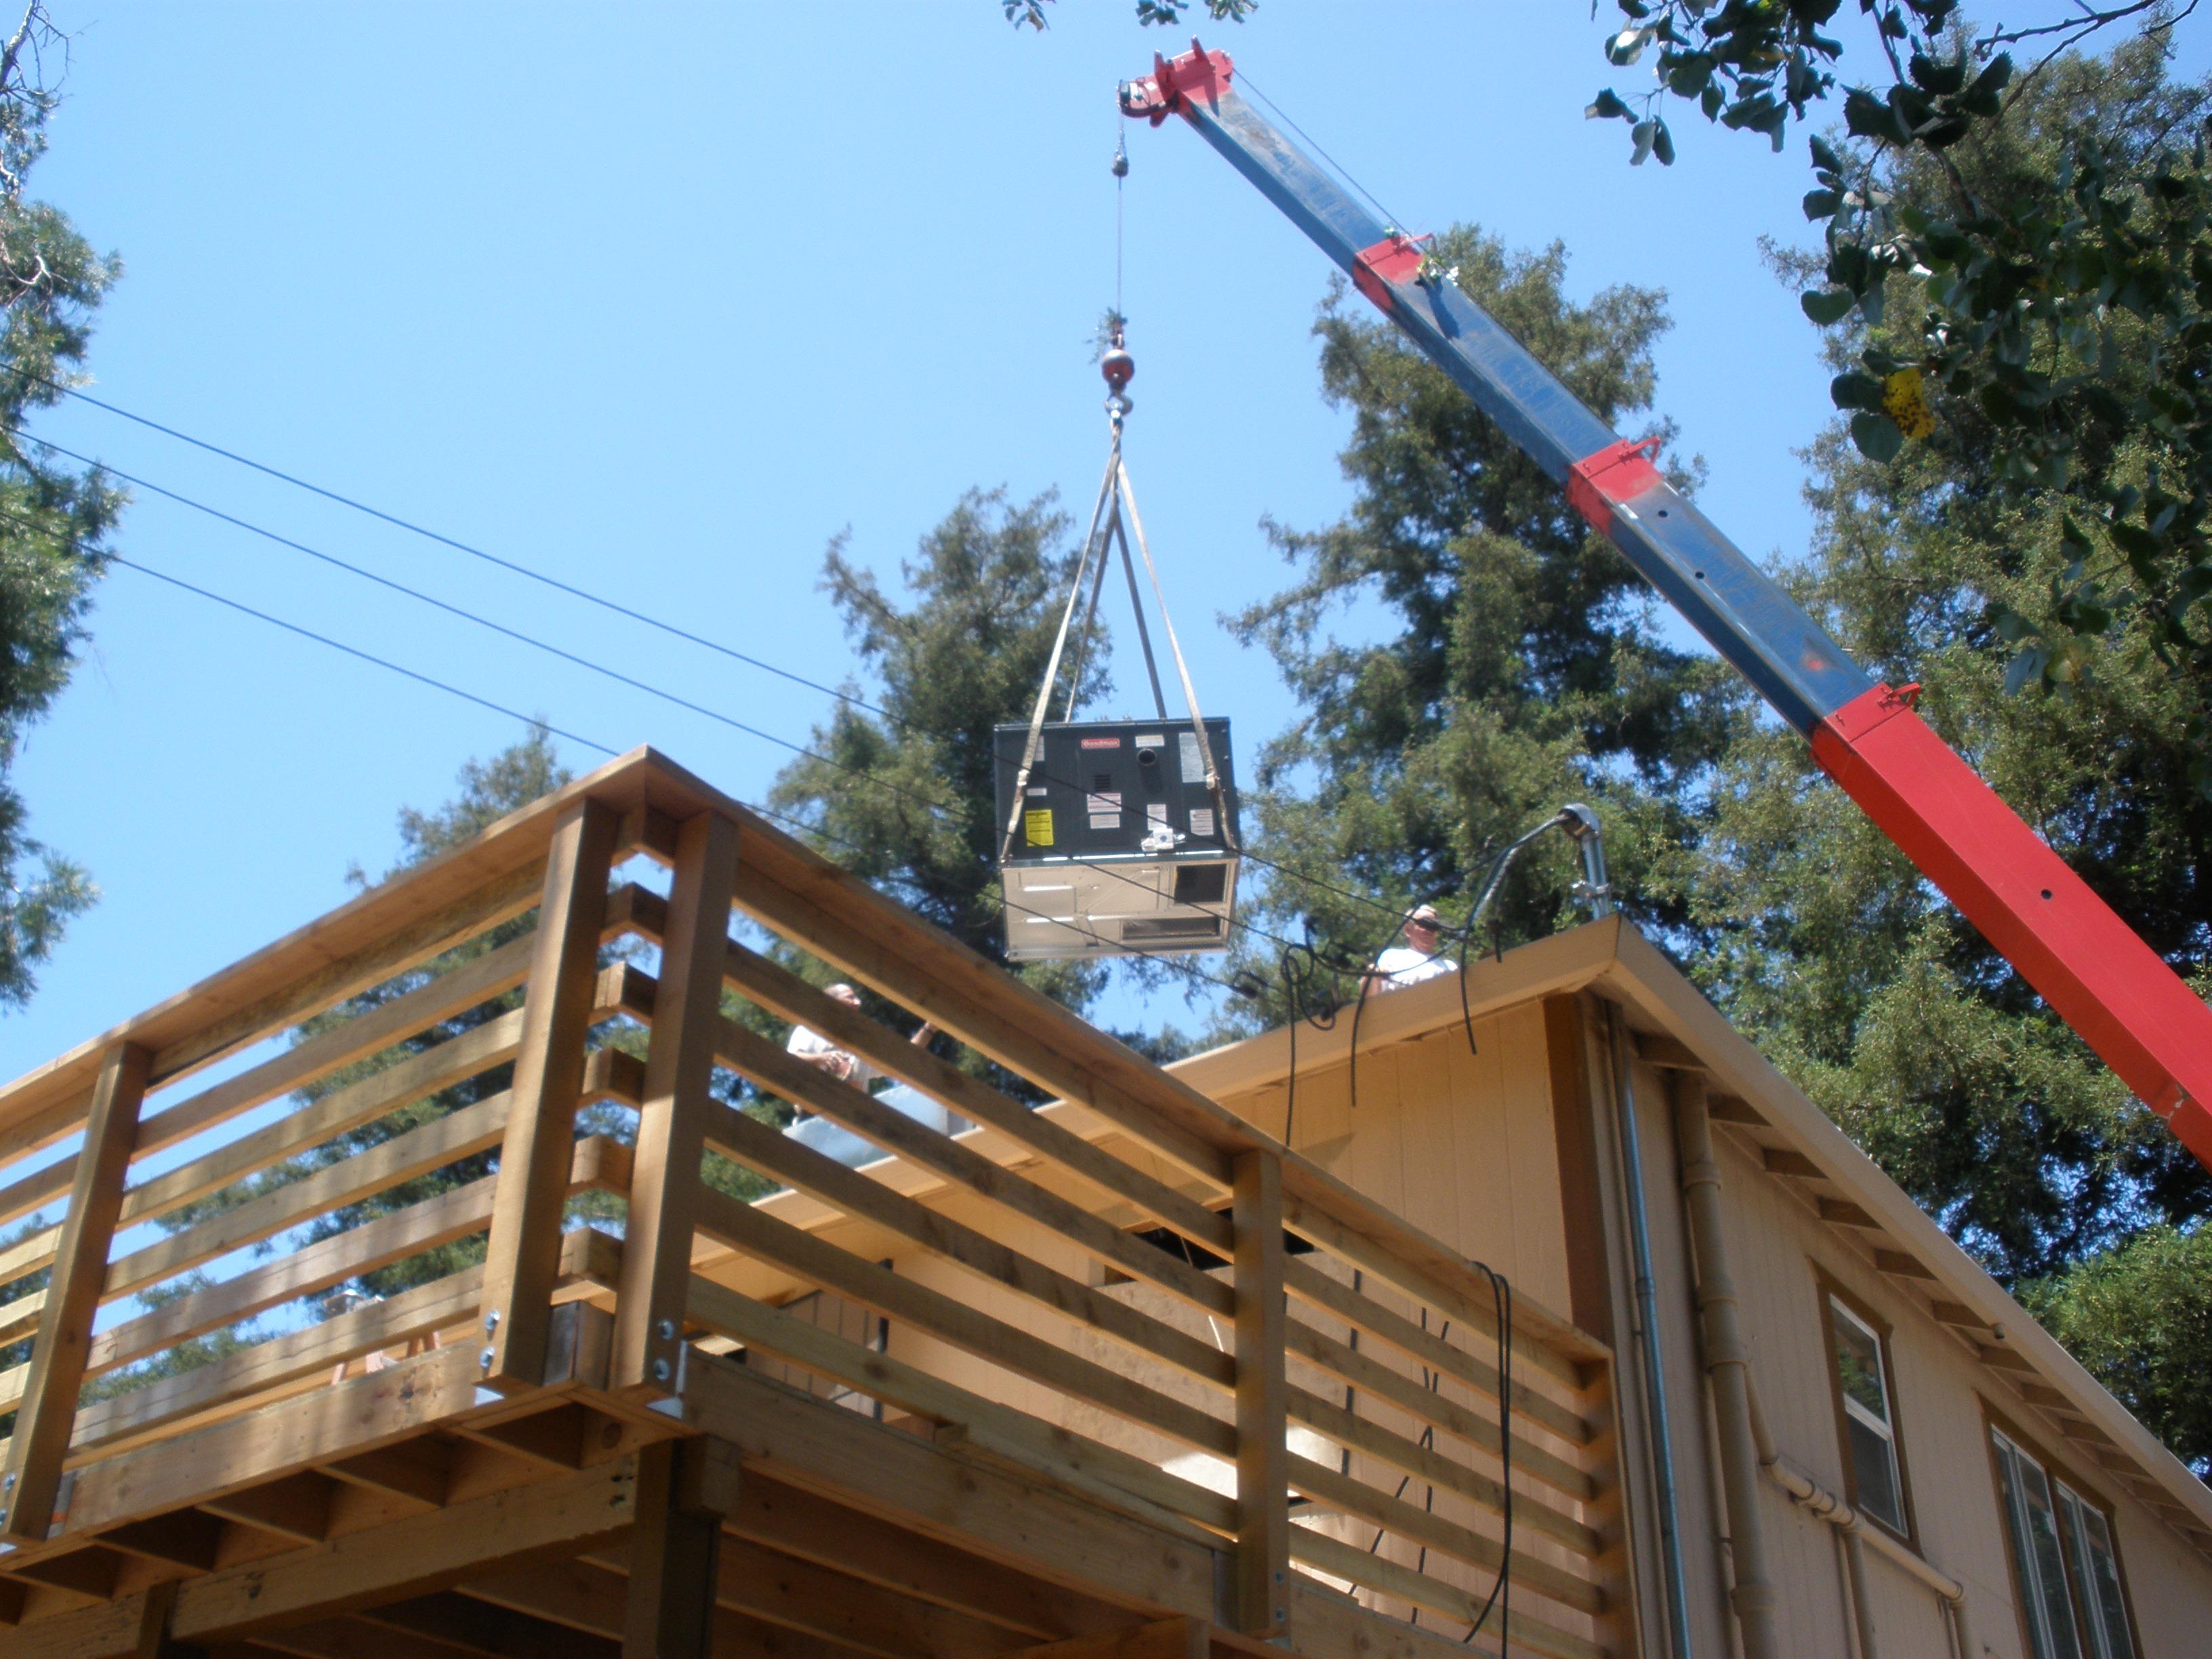 Mike Christiansen, HVAC Contractor, Sacramento, CA